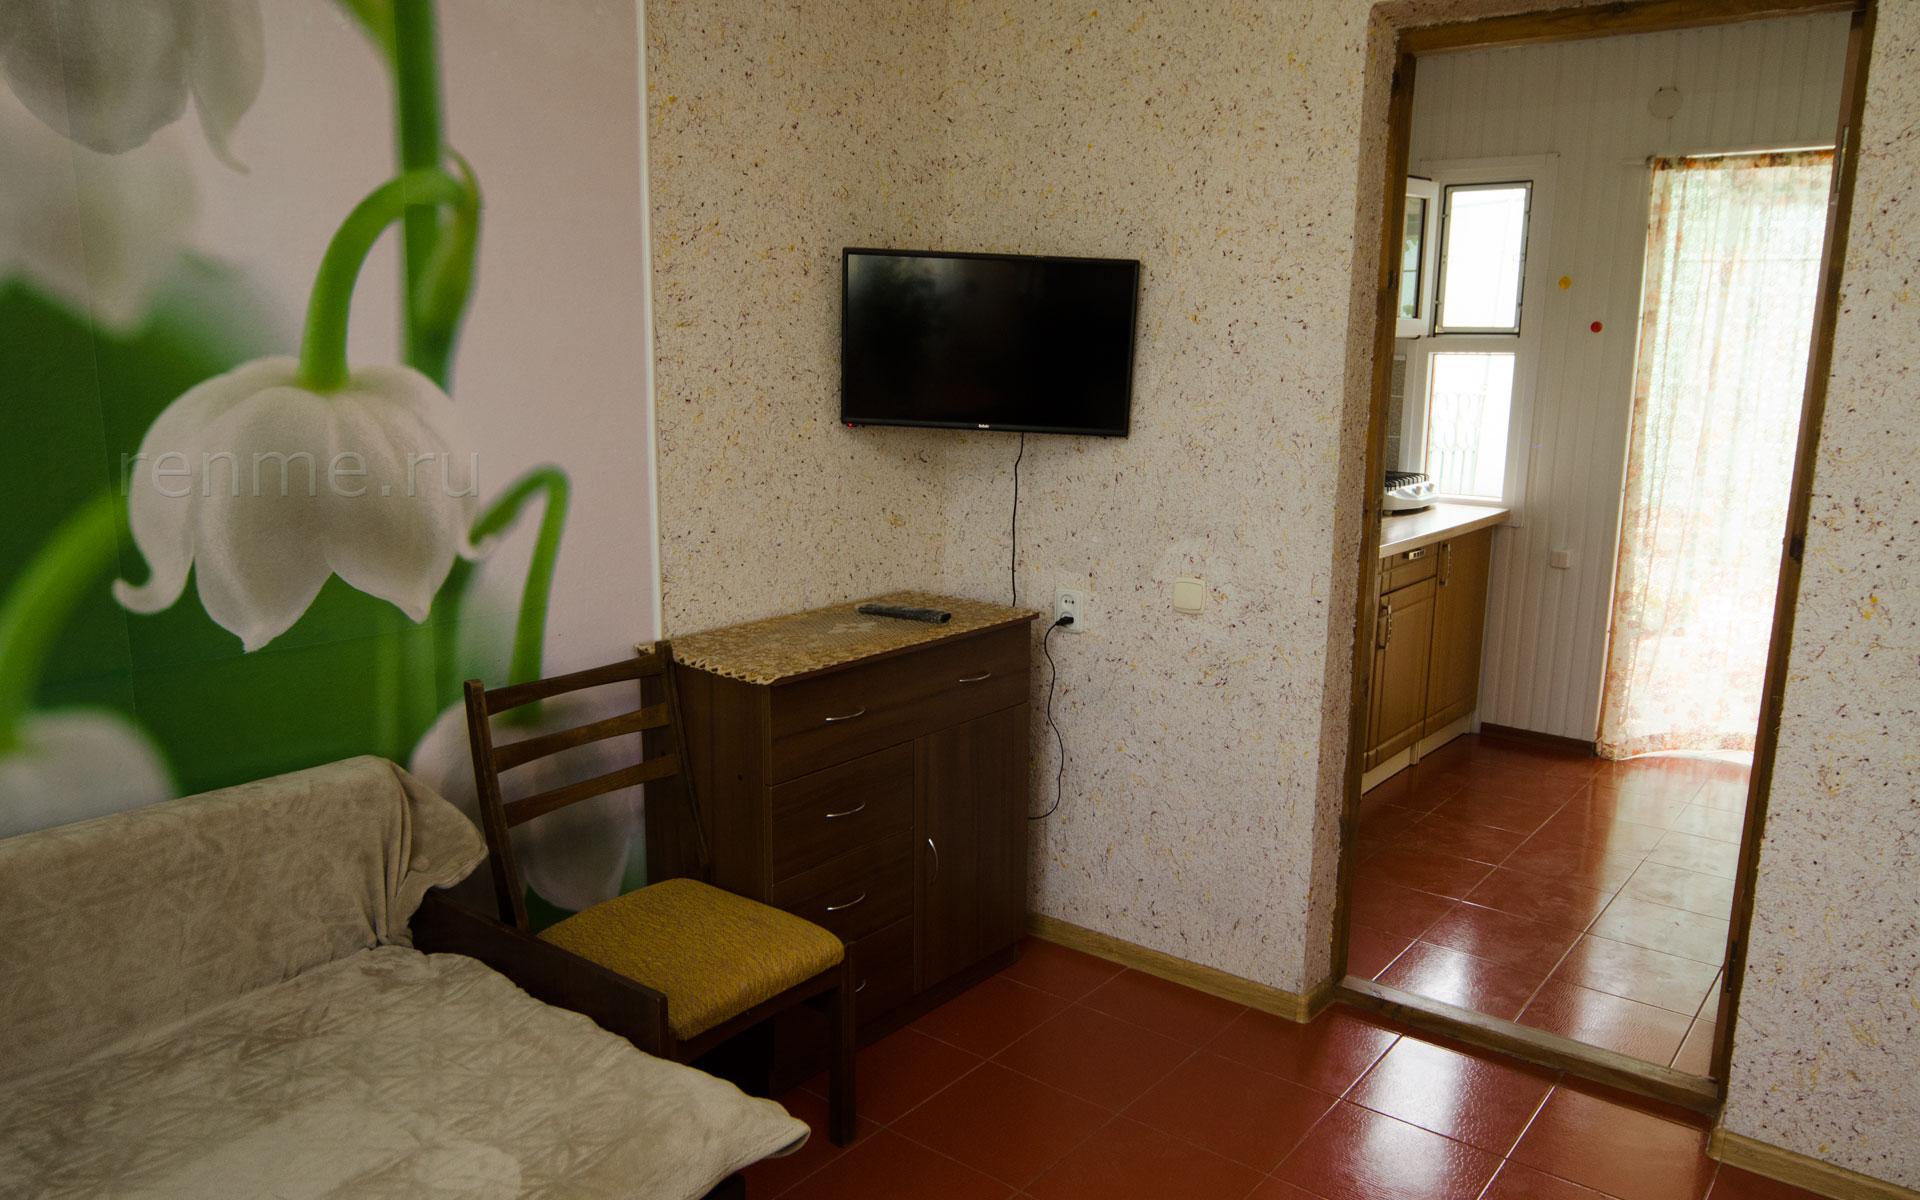 Комната. Ландыши. Апарт-отель на 8 квартир. Заозёрное